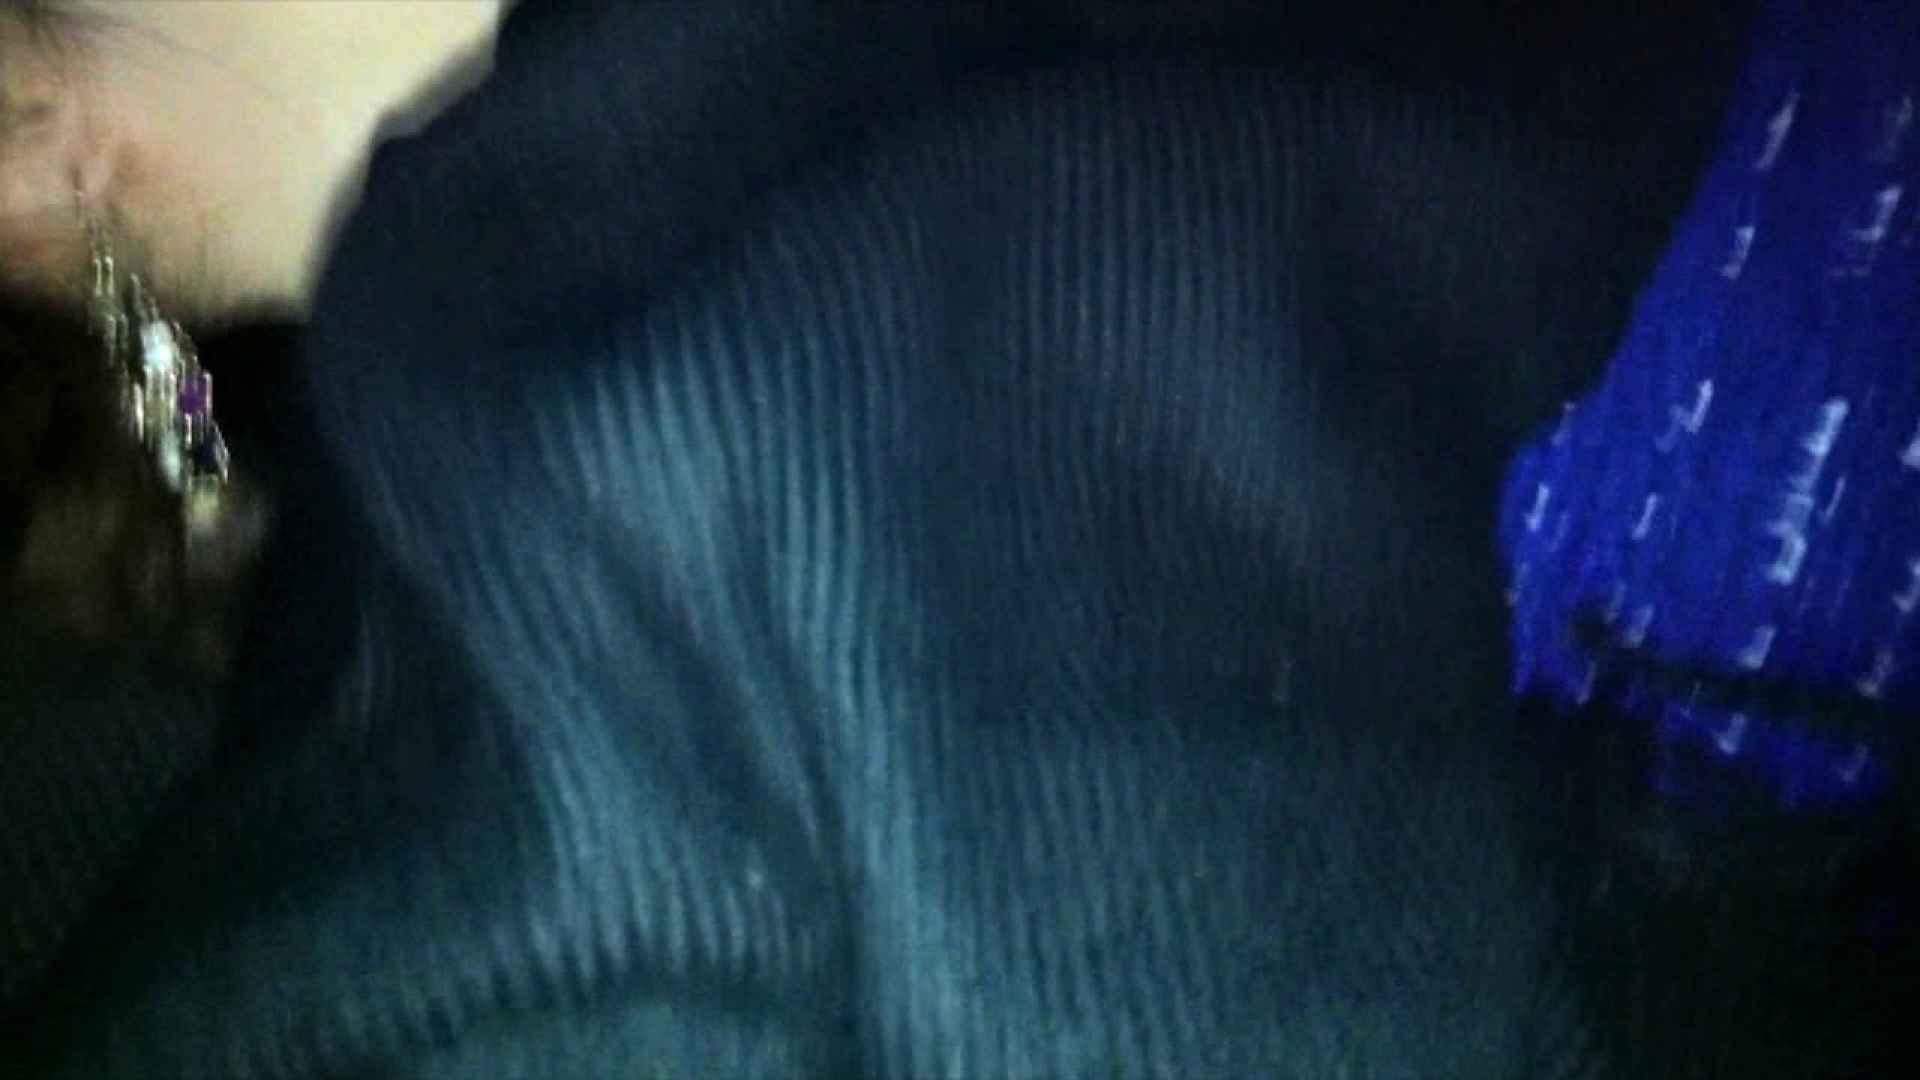 vol.22 【YHちゃん】パルコ店員20歳 mixiオフ会で お姉さんの胸チラ  77画像 40